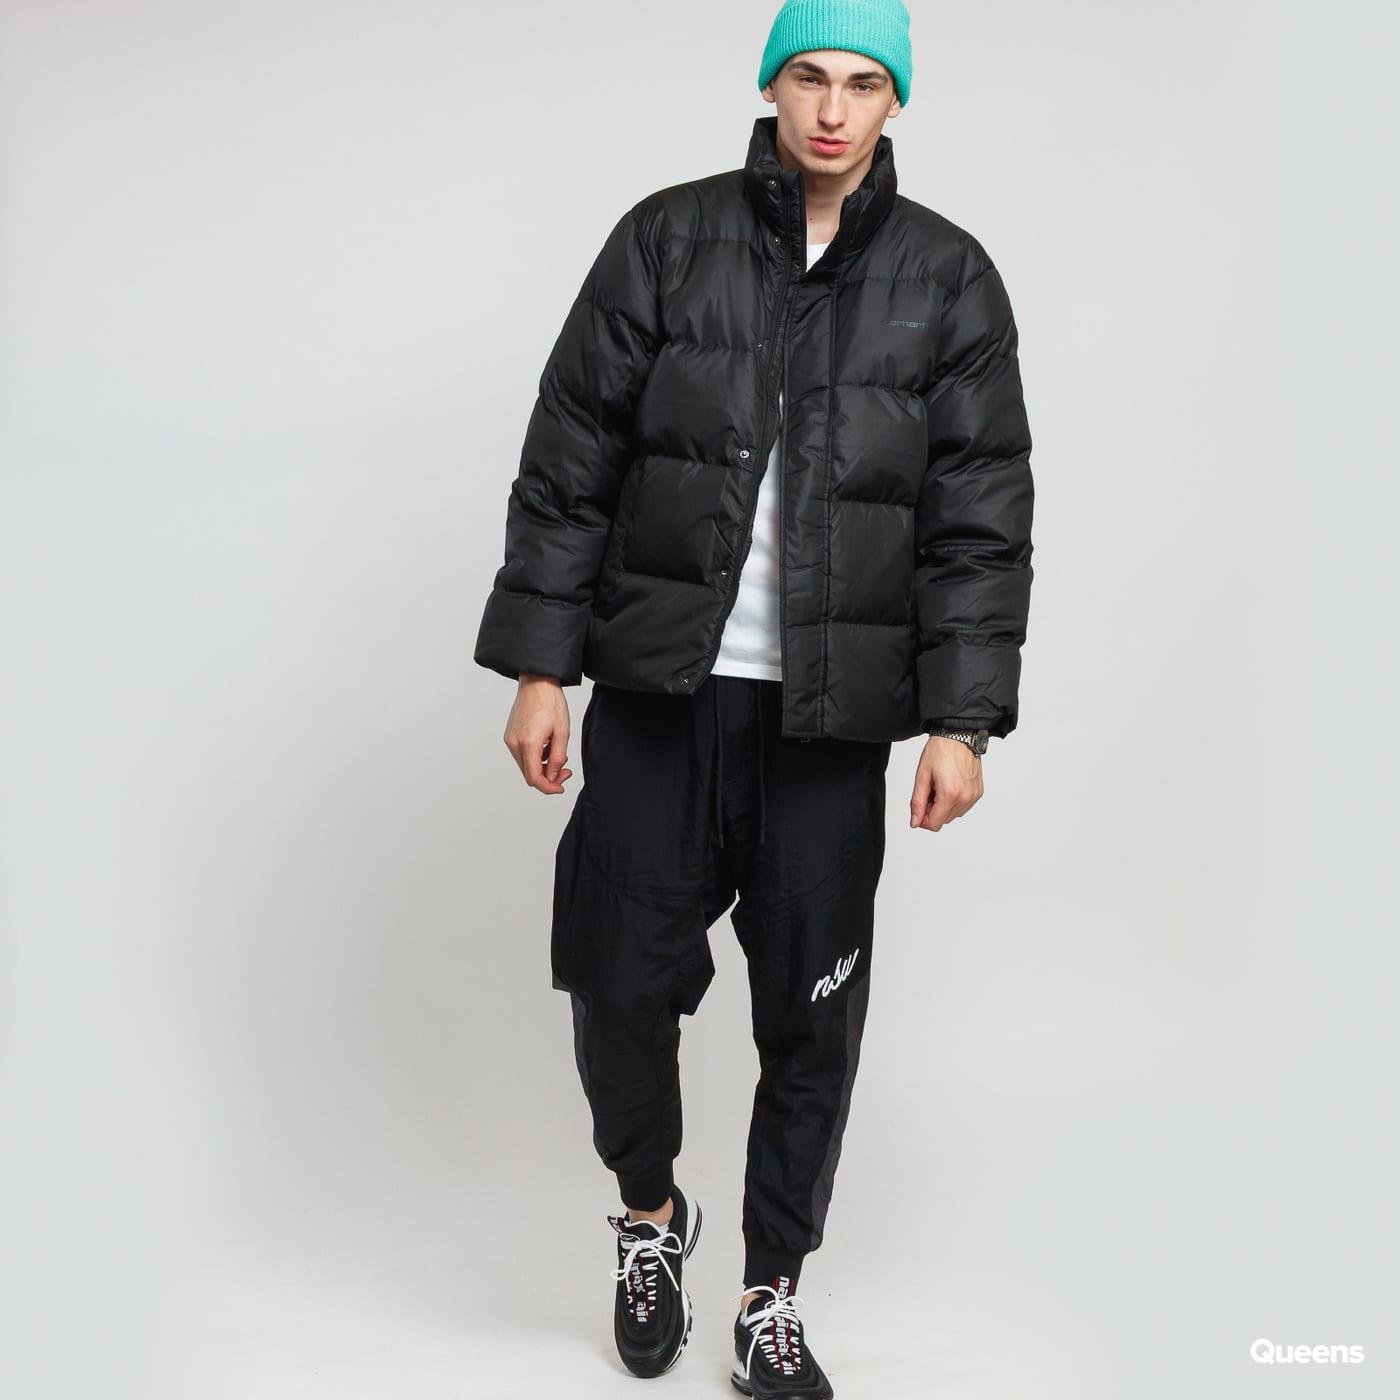 Pánská zimní bunda Carhartt WIP Deming Jacket (I025113.89.00.03) – Queens 💚 7ce86dfd00e